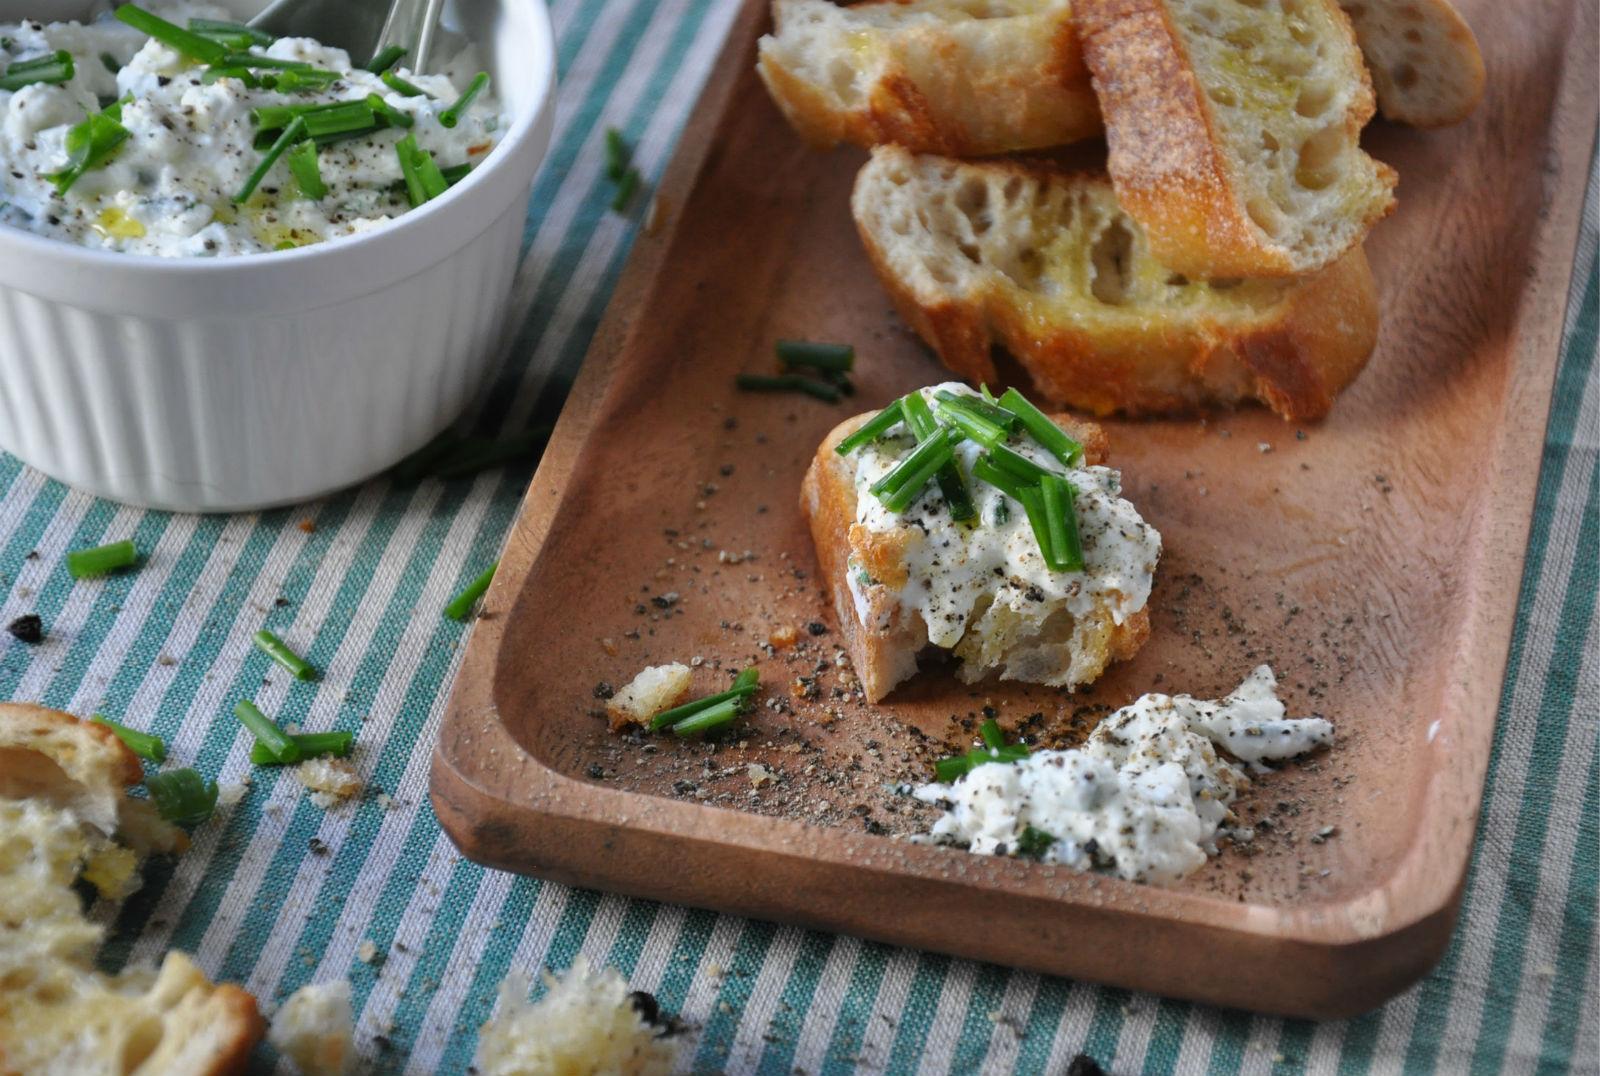 HiP Paris blog. My Paris Market Cookbook. French recipes with seasonal ingredients.